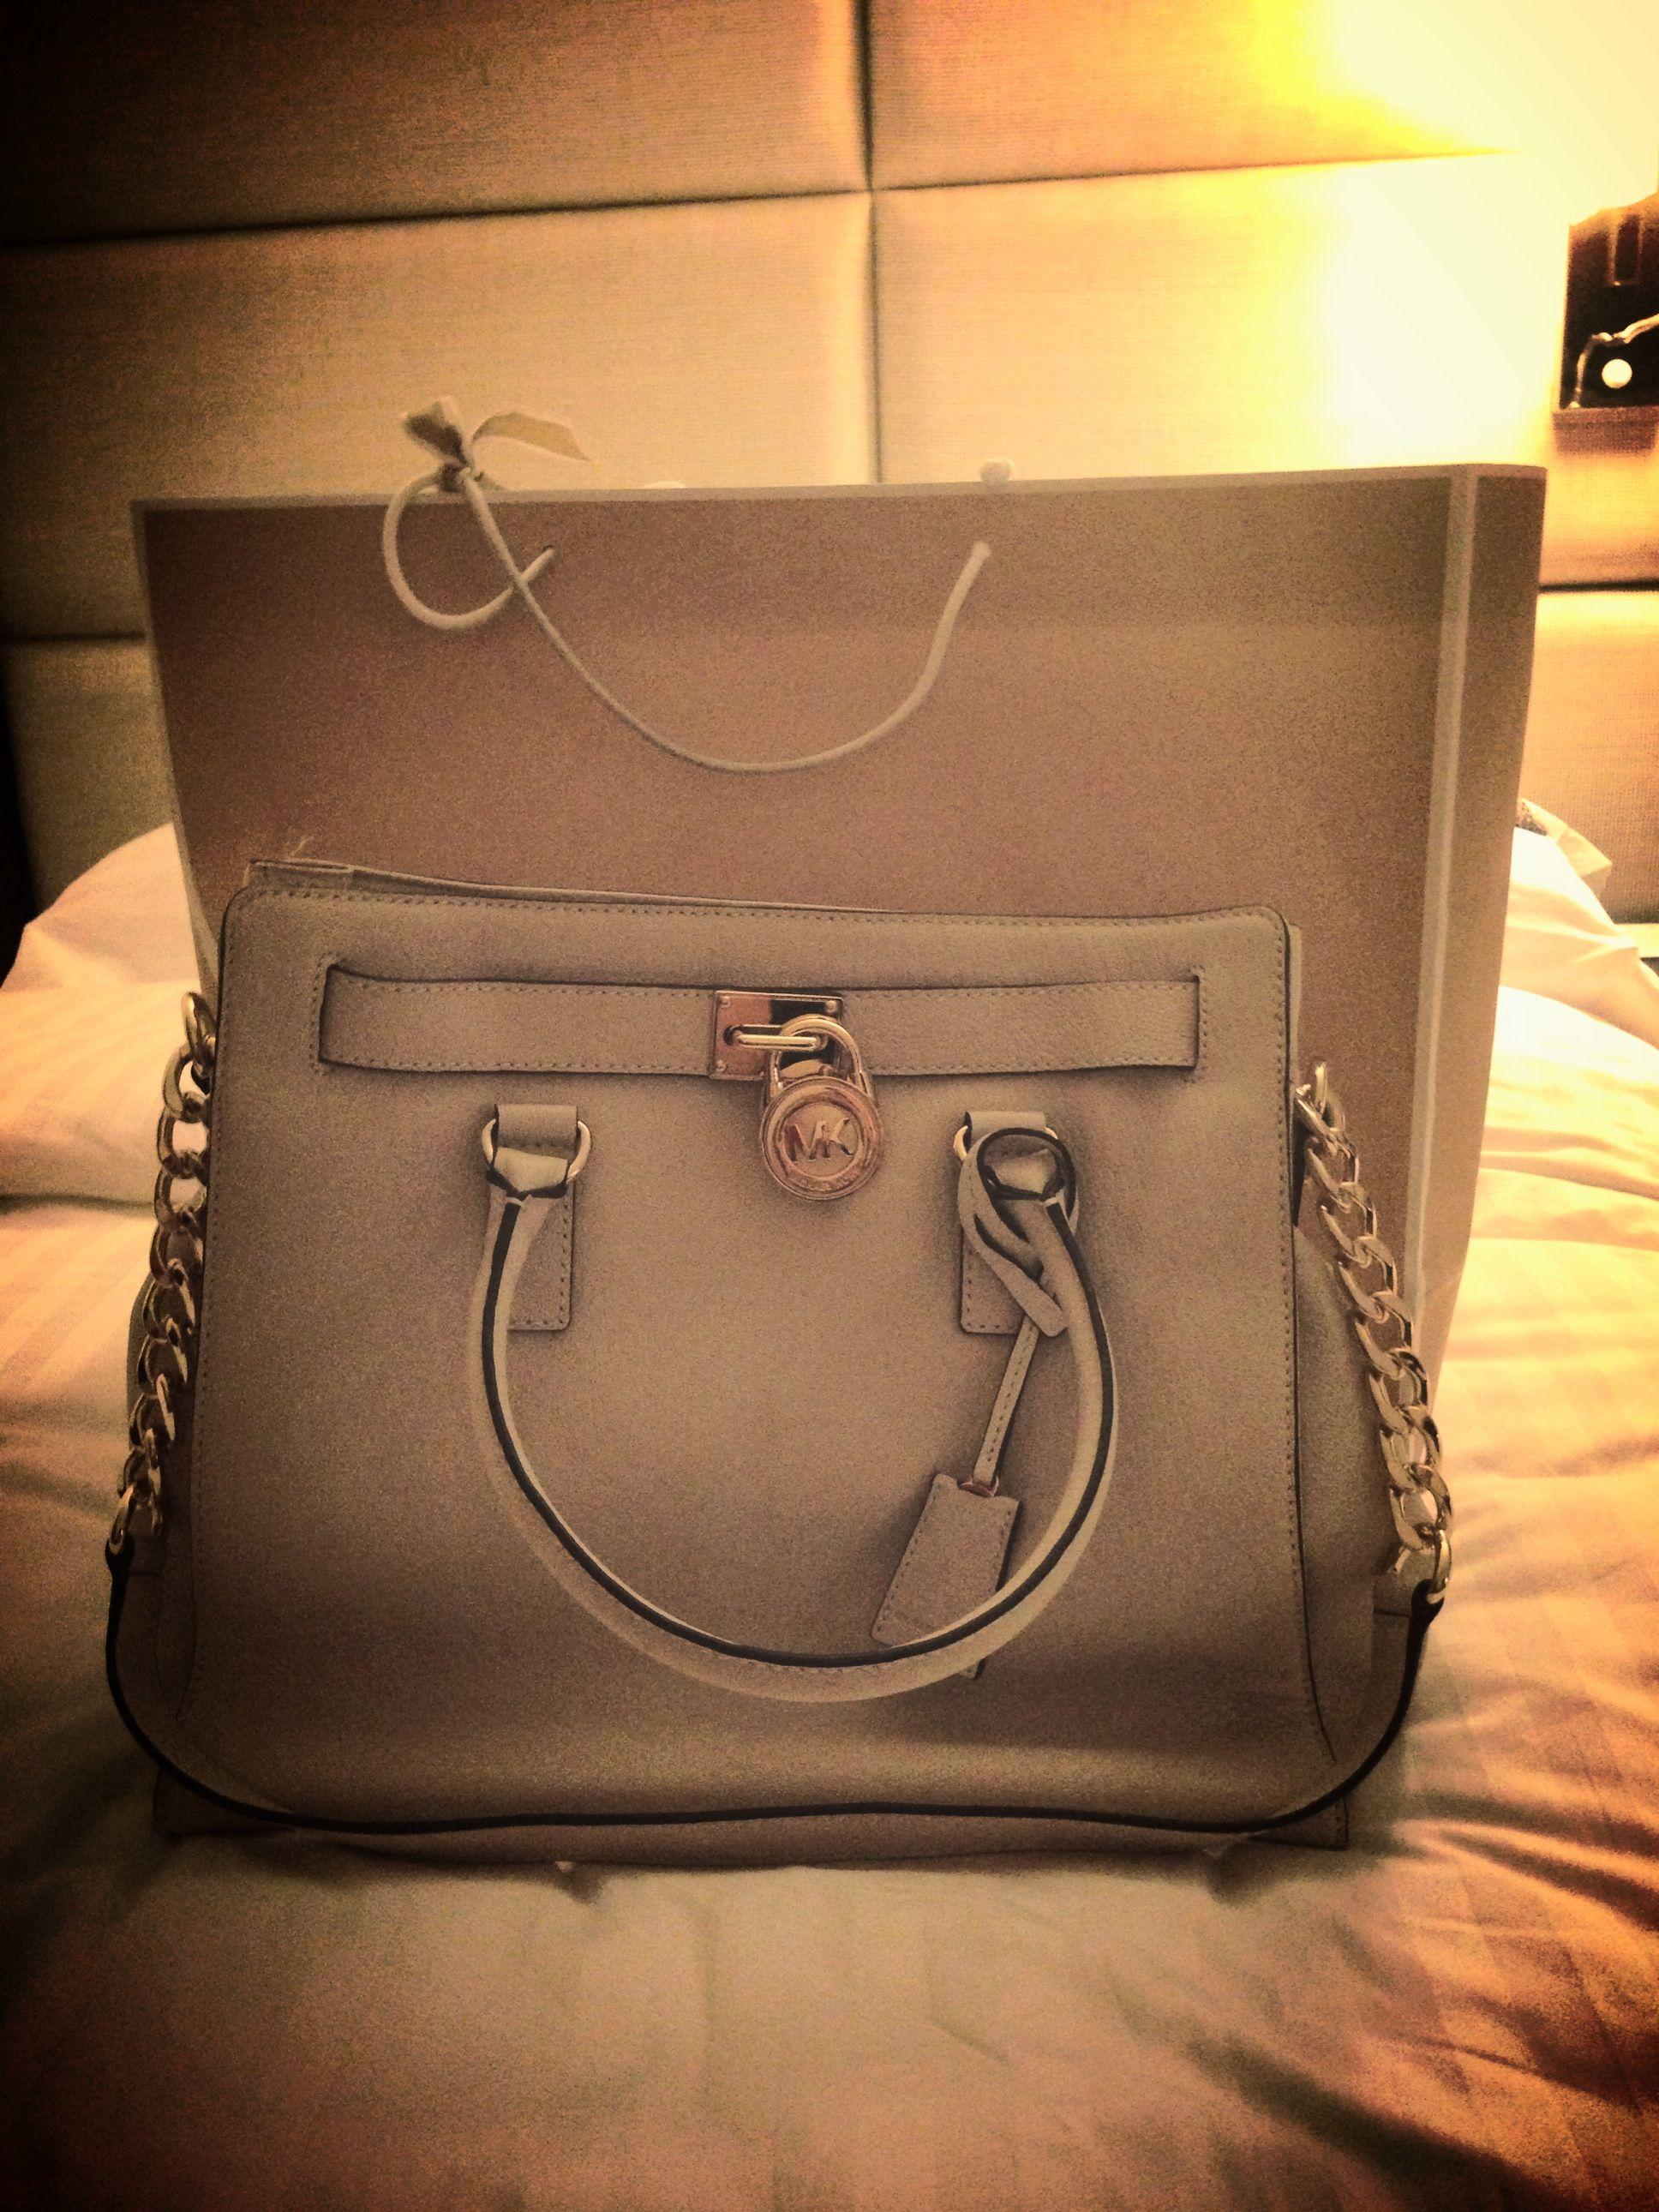 Micheal Kors Handbag Thegoodbags Website For Michael Bags Lowest Price